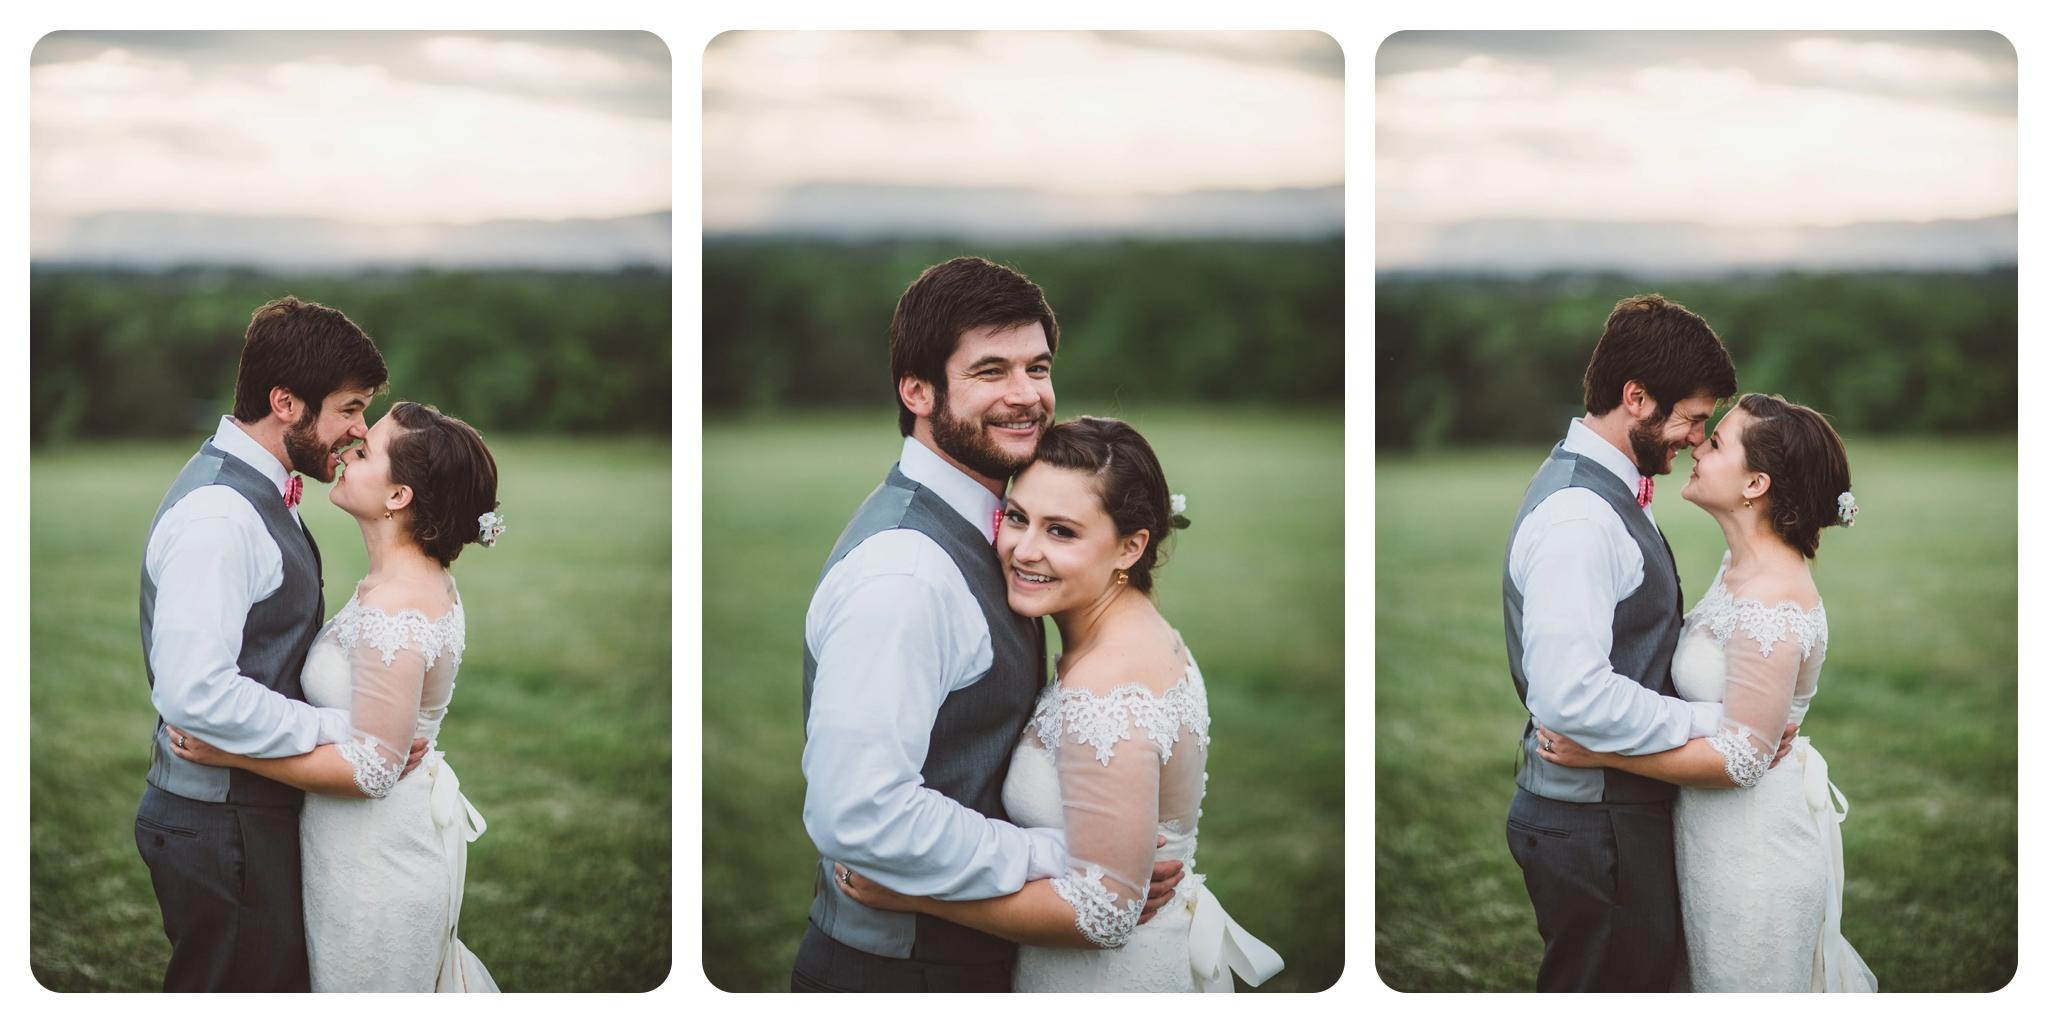 Braeloch-Weddings-Wedding-Photographer-Pat-Cori-Photography-029.jpg